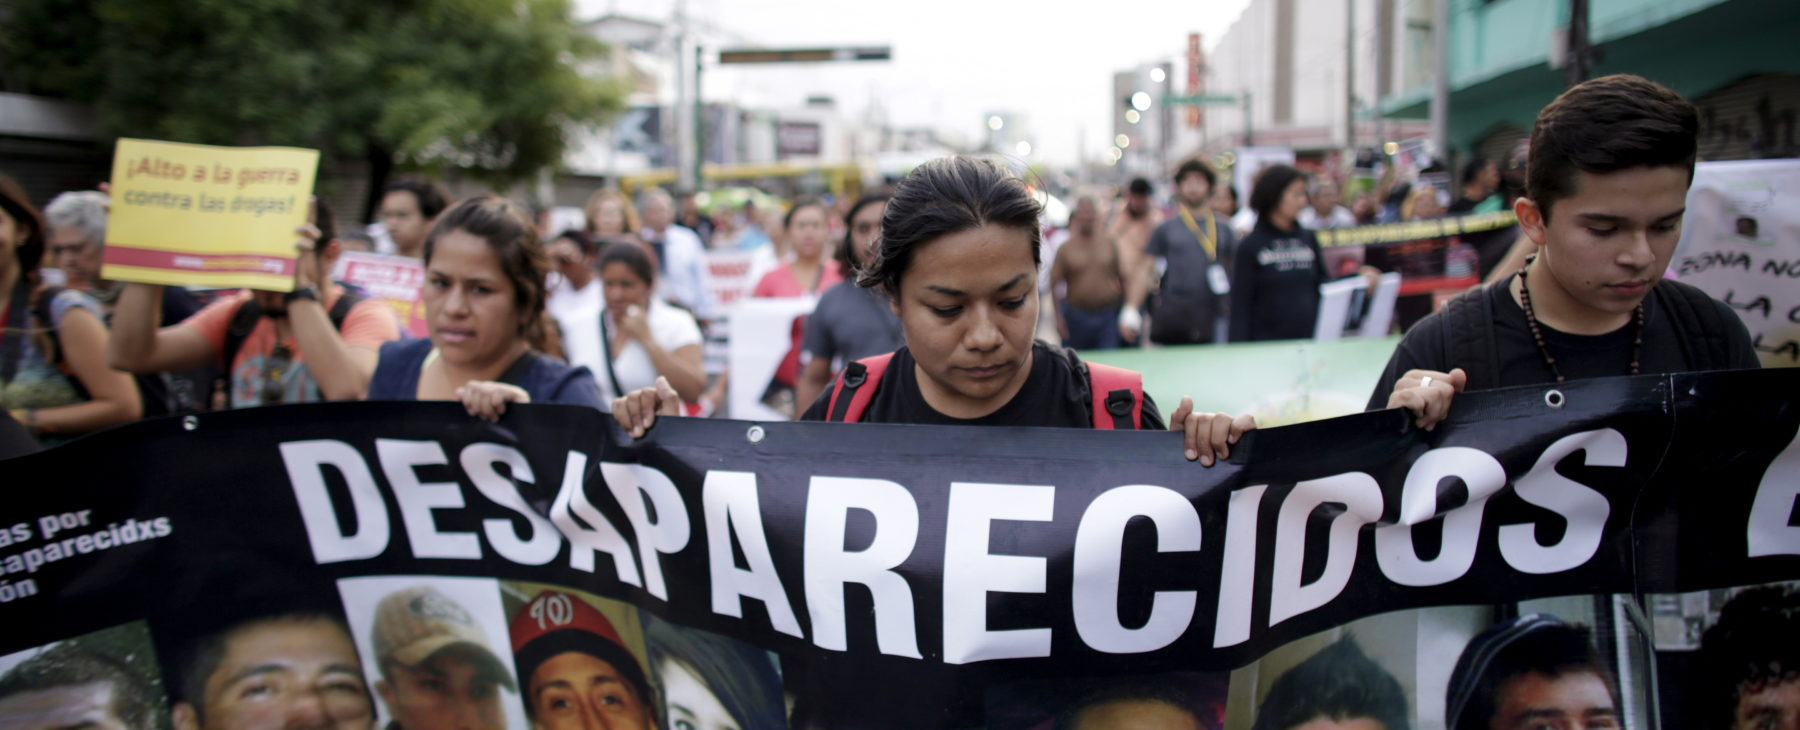 Mexico: Raising awareness